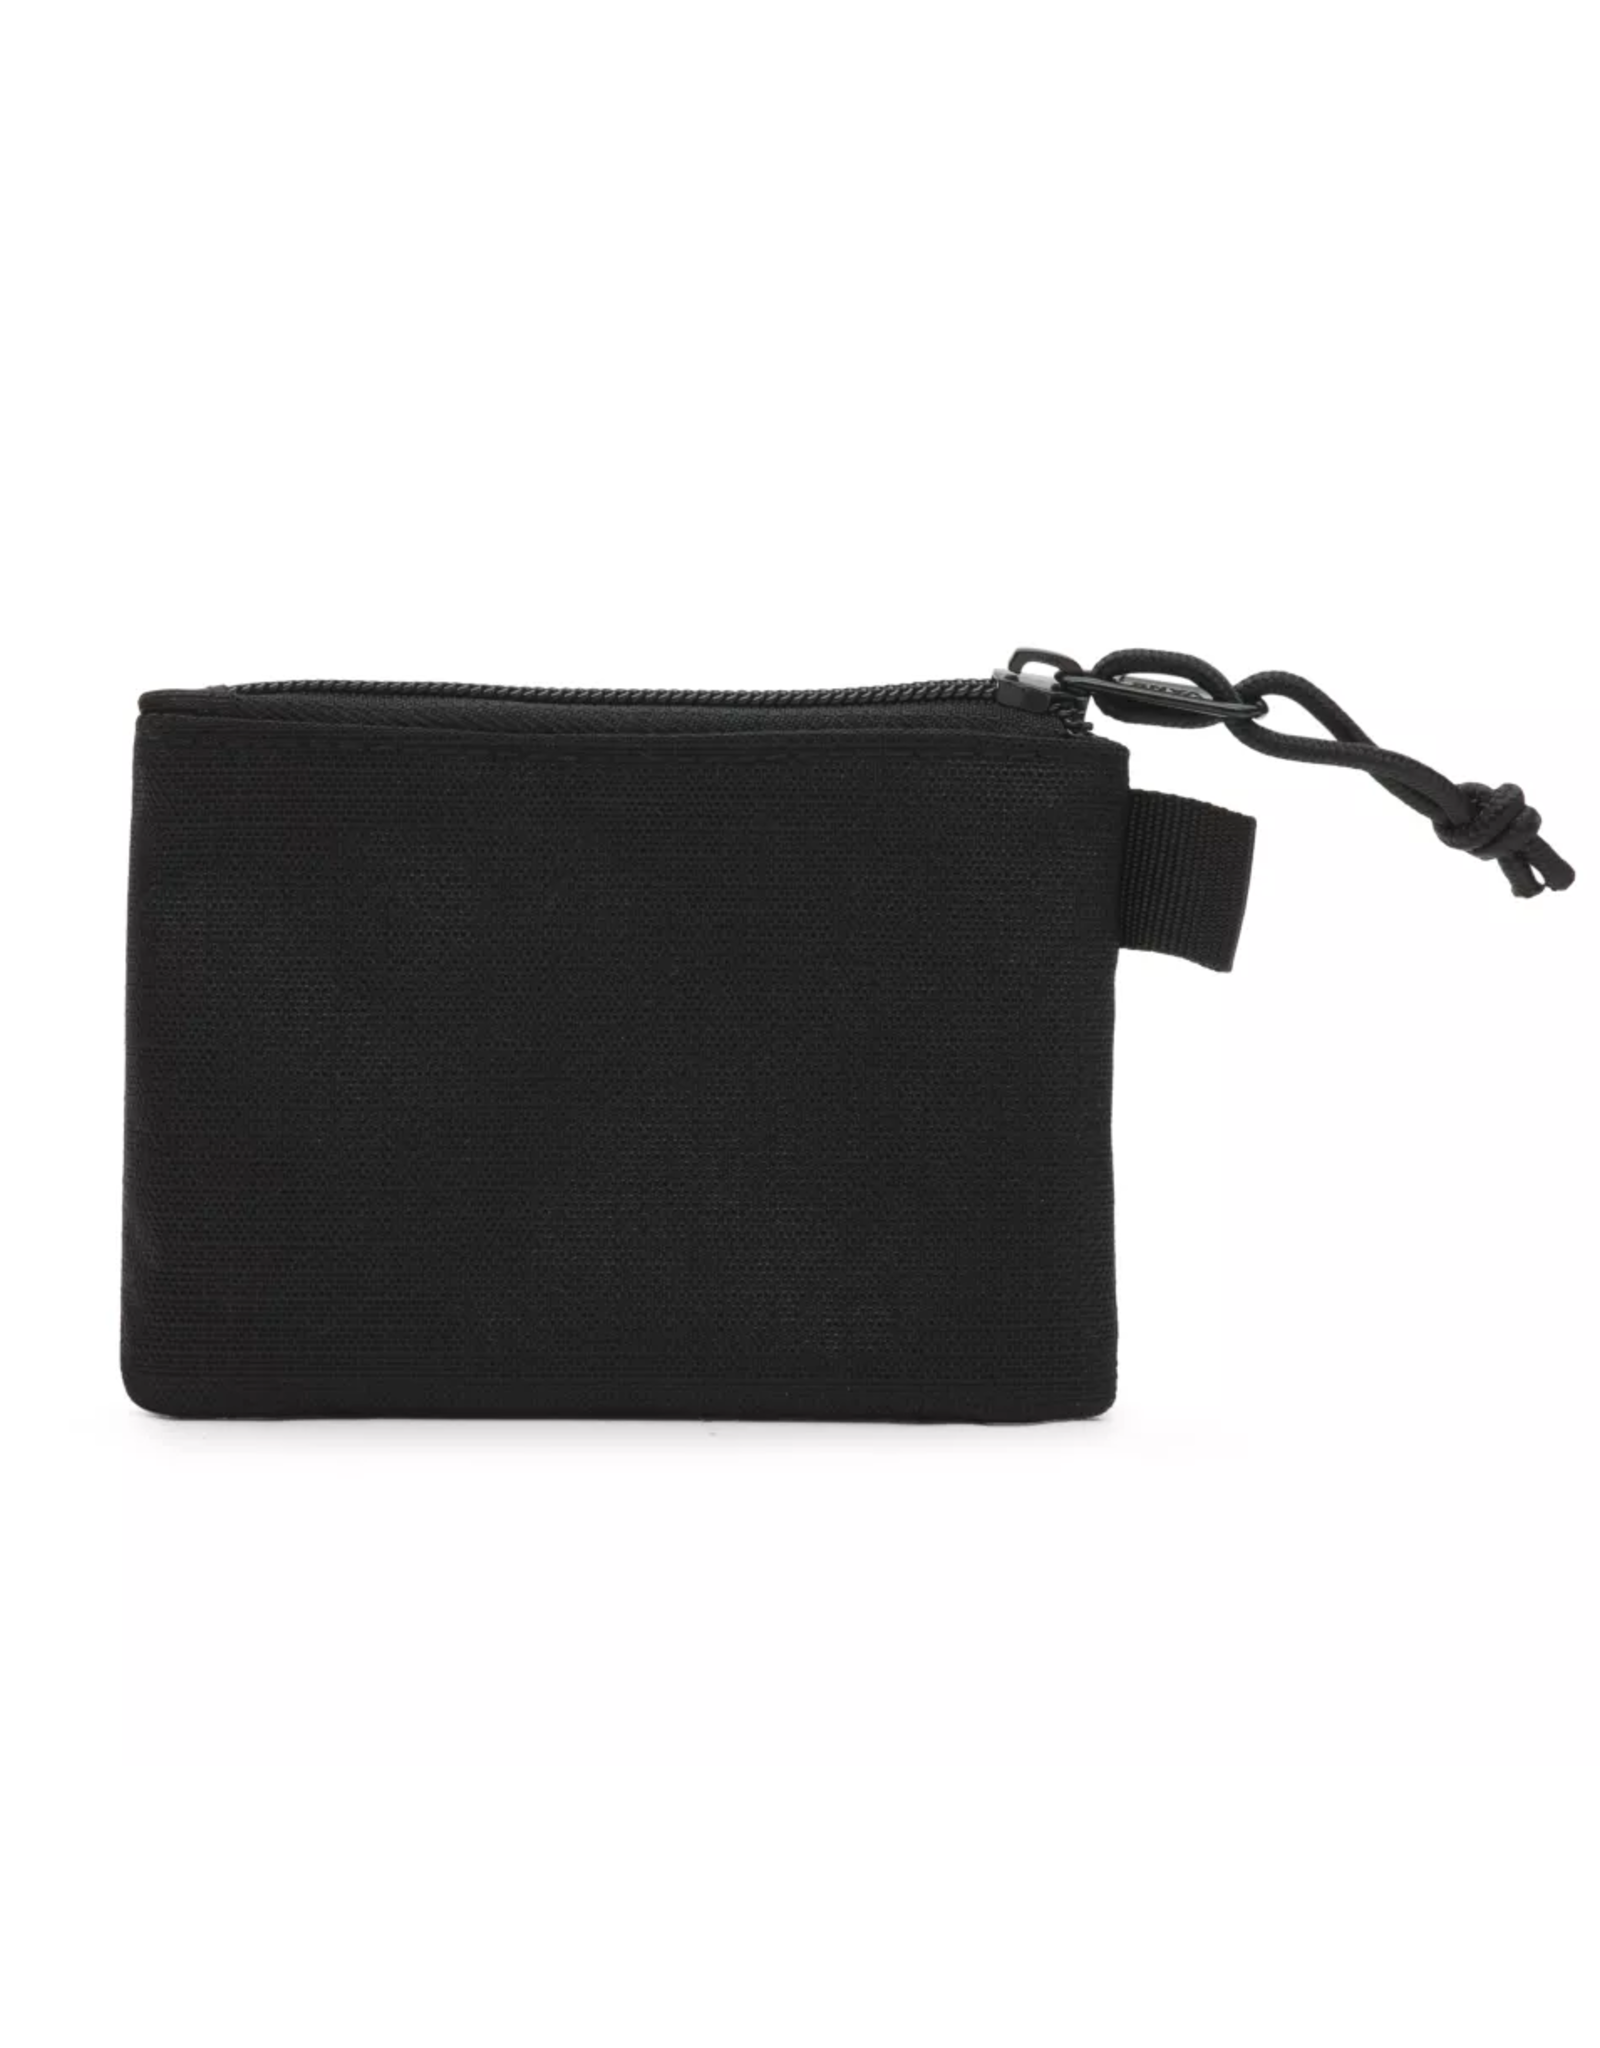 Vans Pouch Wallet - Black/Ripstop